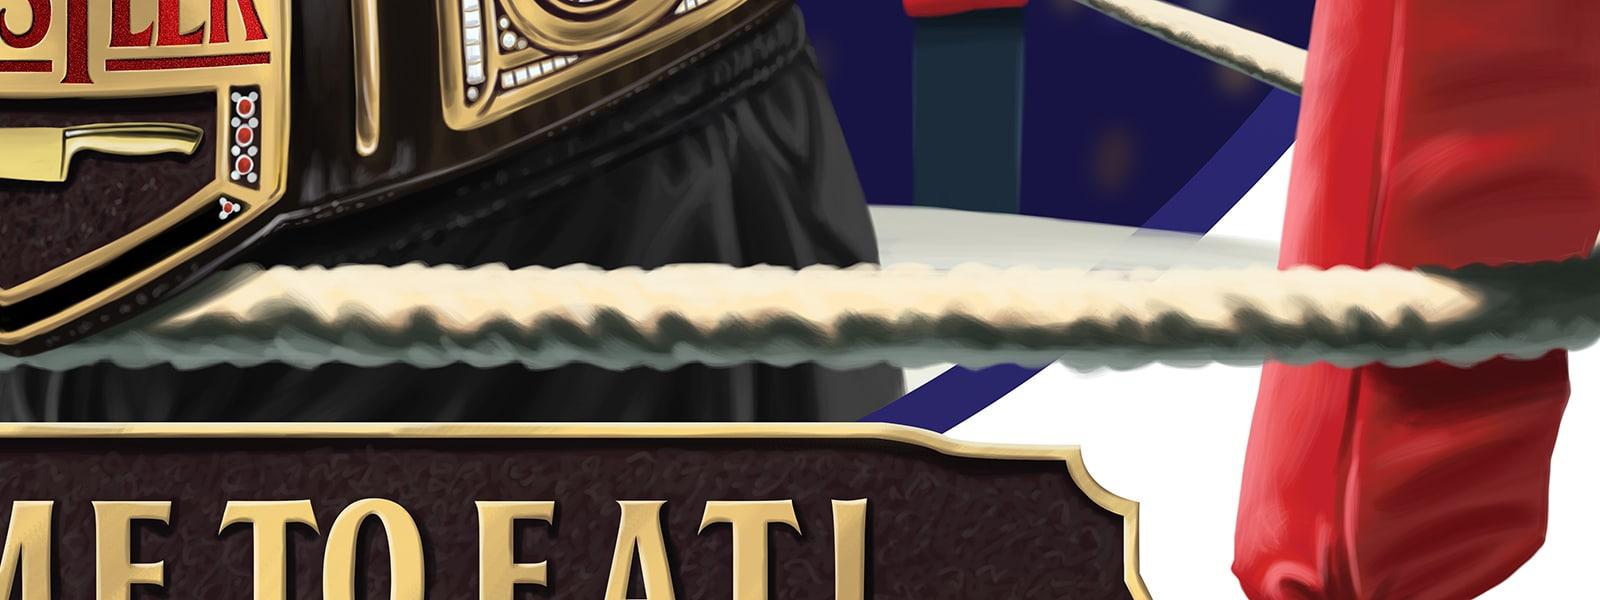 Belt and Panel